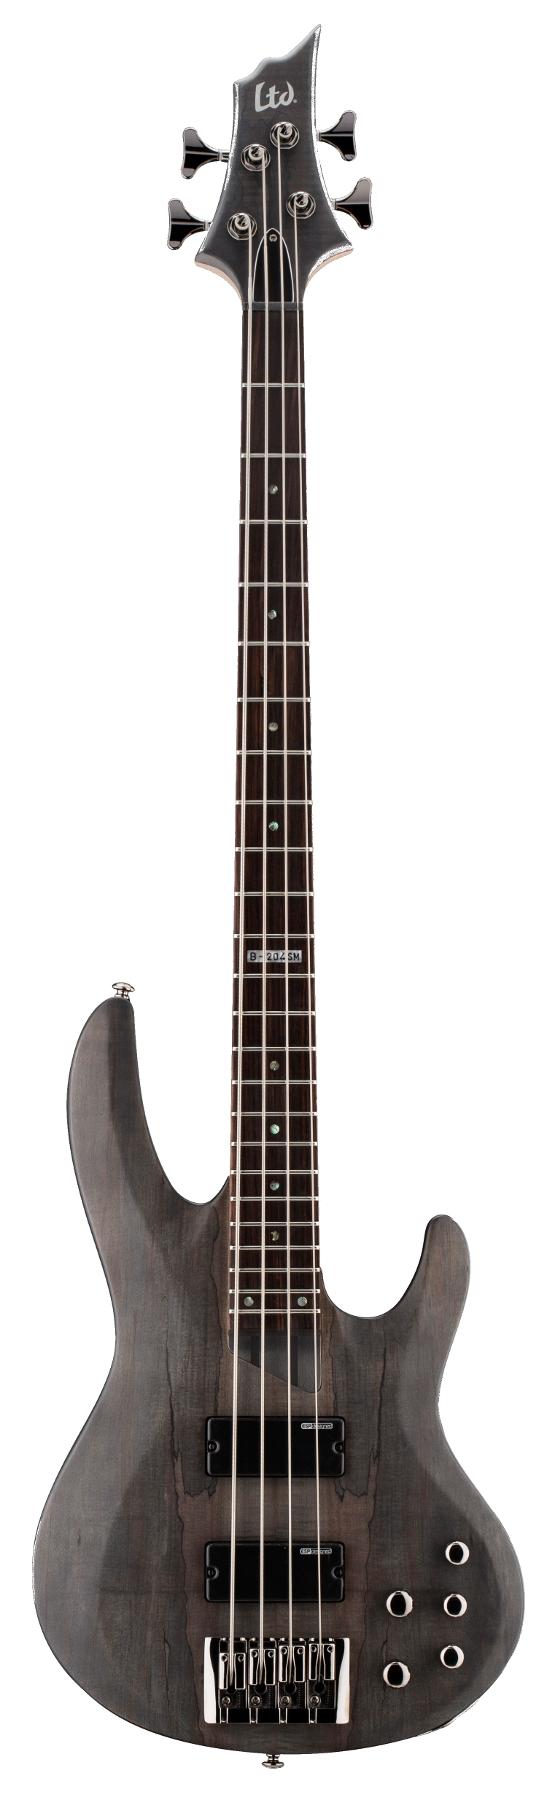 Electric Bass Guitar, See Thru-Black Satin